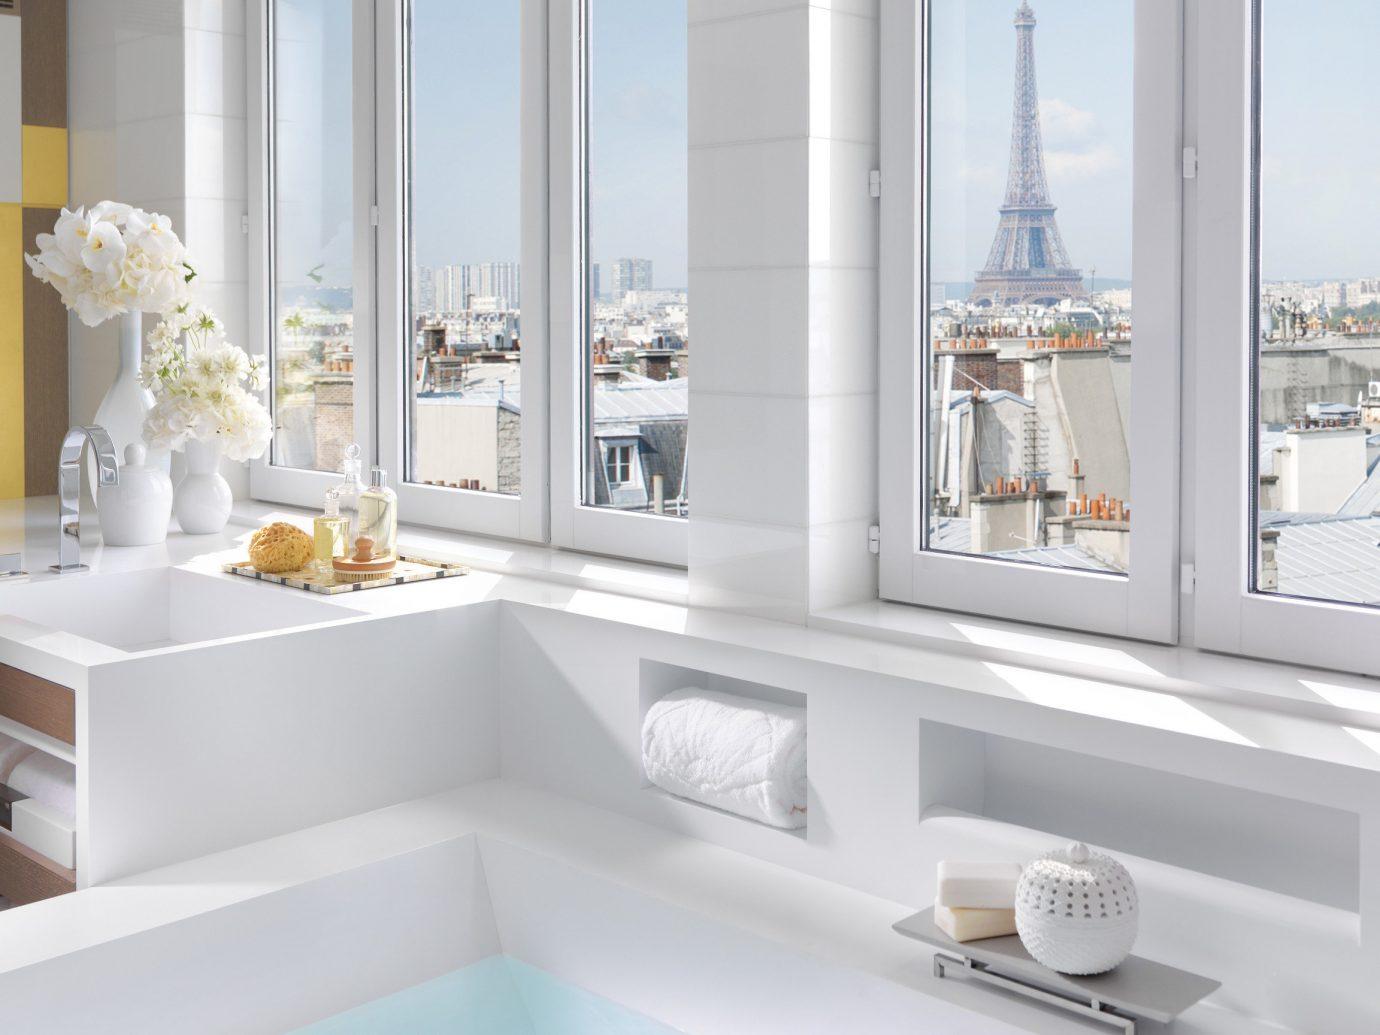 Hotels Luxury Travel window indoor room bathroom interior design tap home bathtub plumbing fixture sink Suite bathroom cabinet bathroom accessory angle